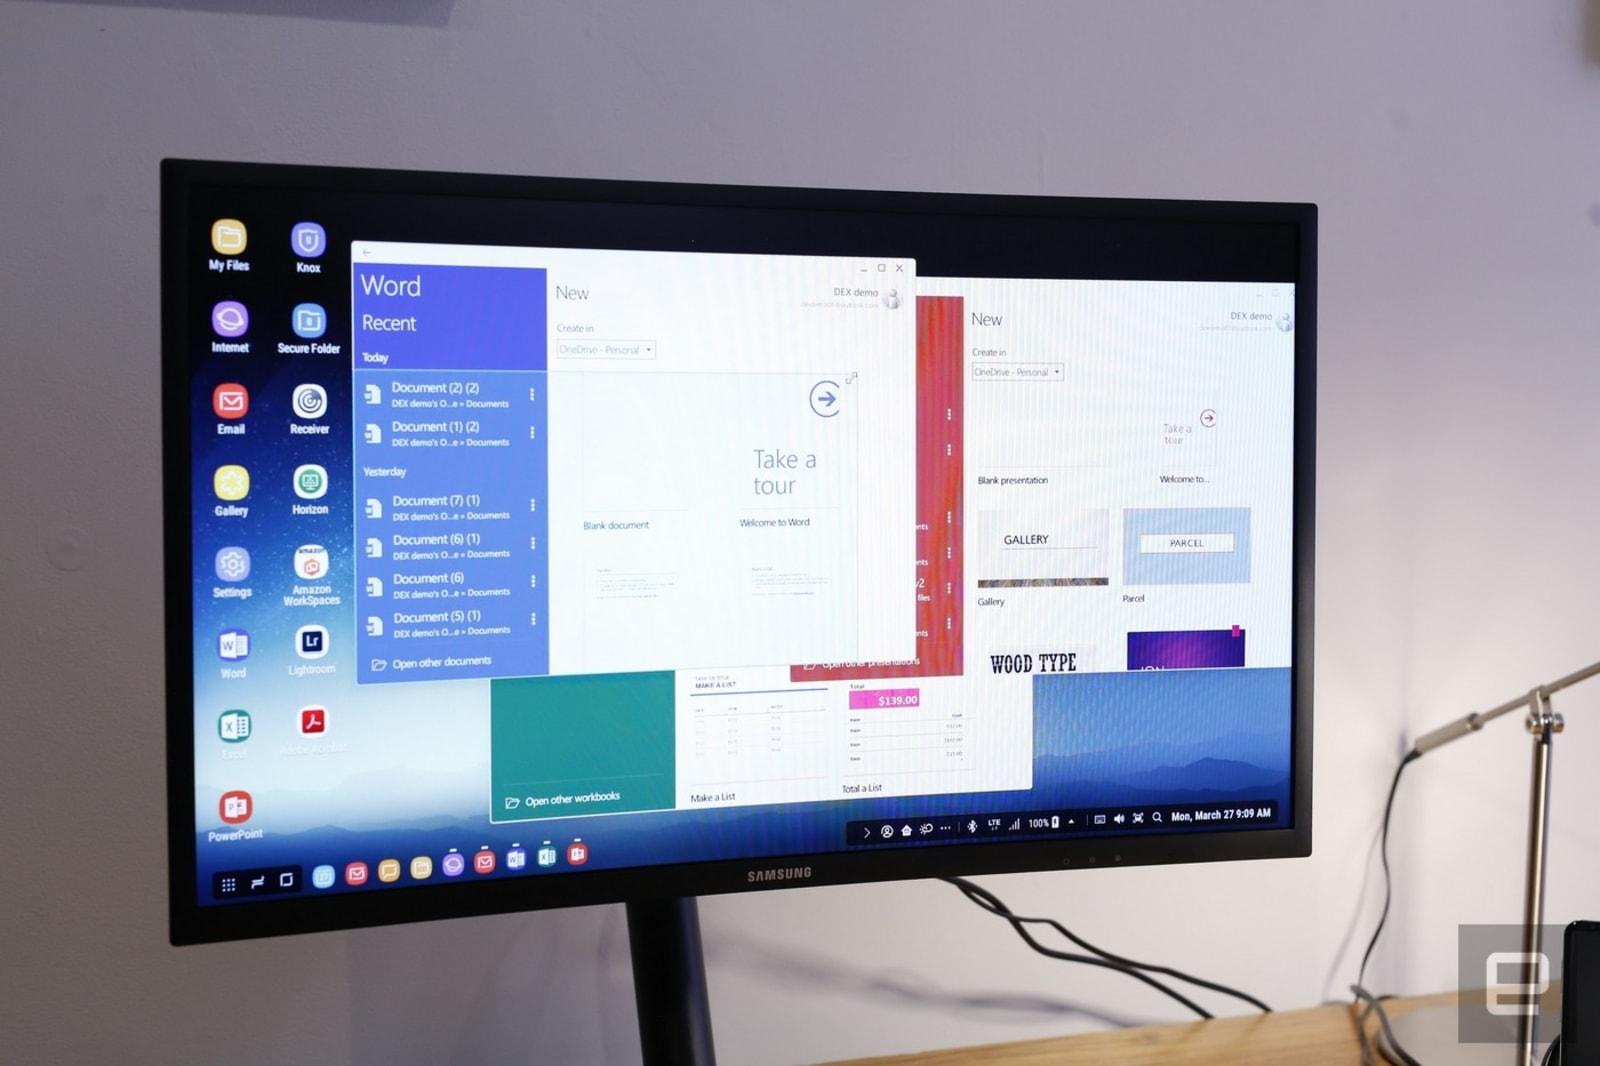 The Galaxy S8 can double as a pretend desktop